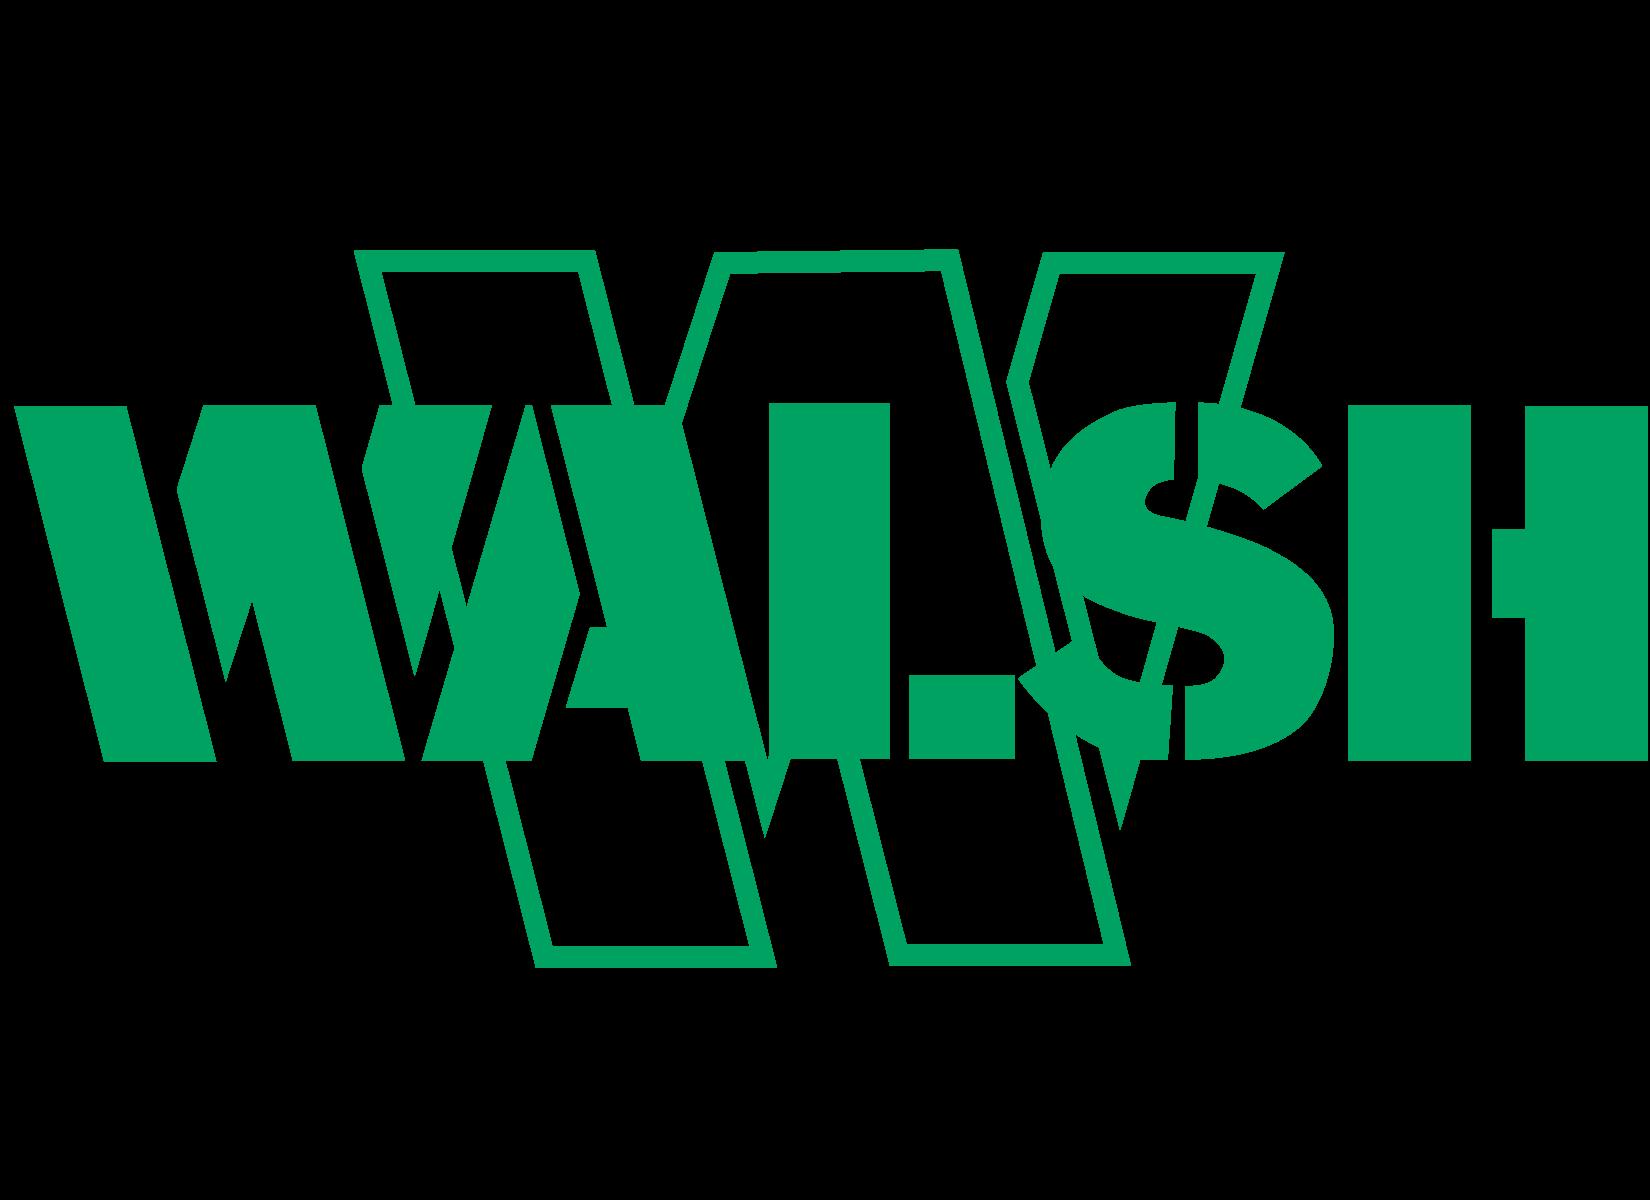 Walsh-Logo-1-5796.png